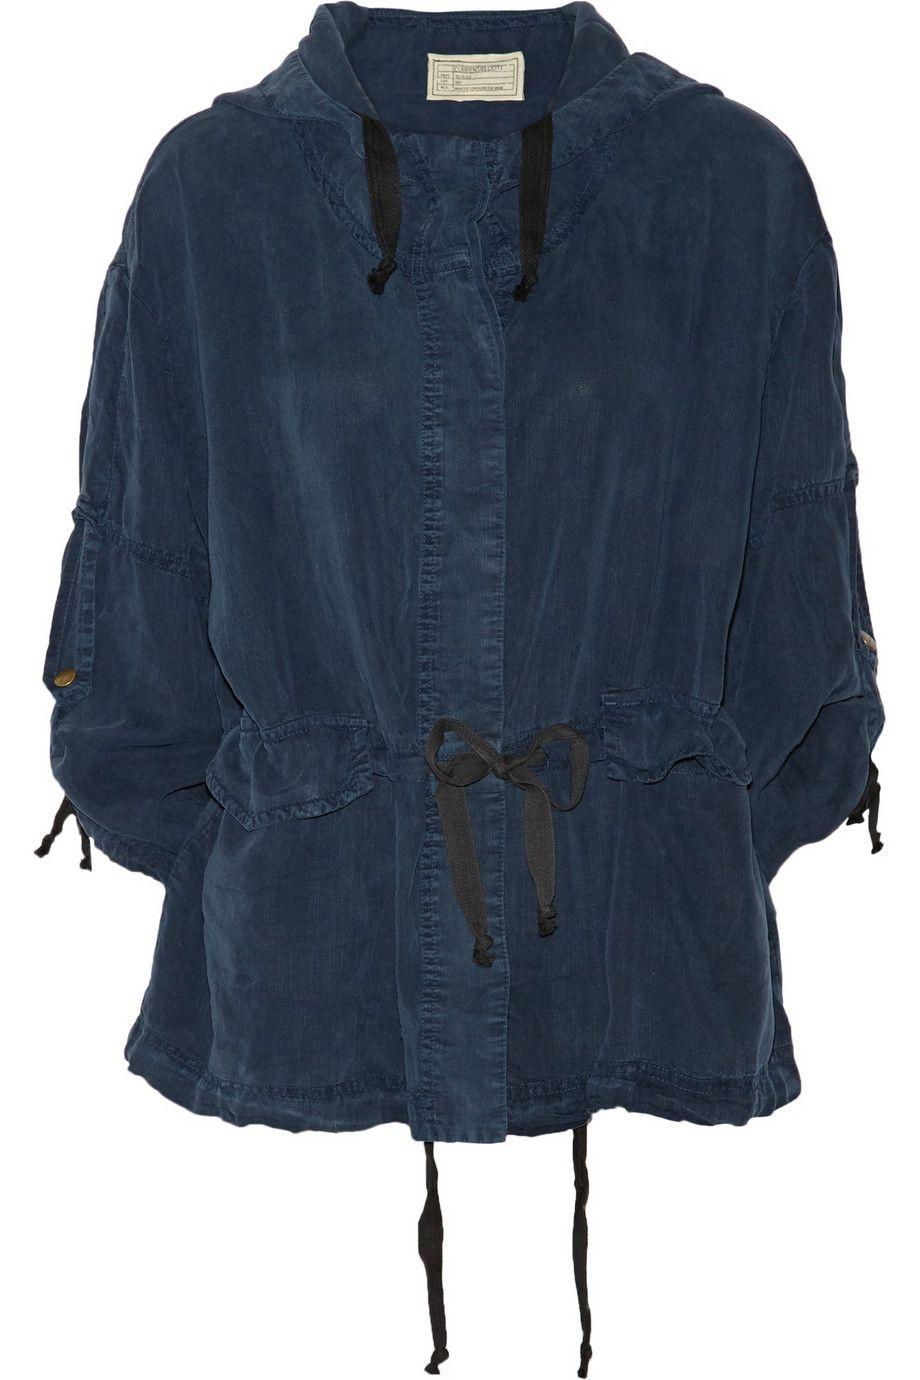 Current/ElliottThe Summer Parka hooded twill jacket